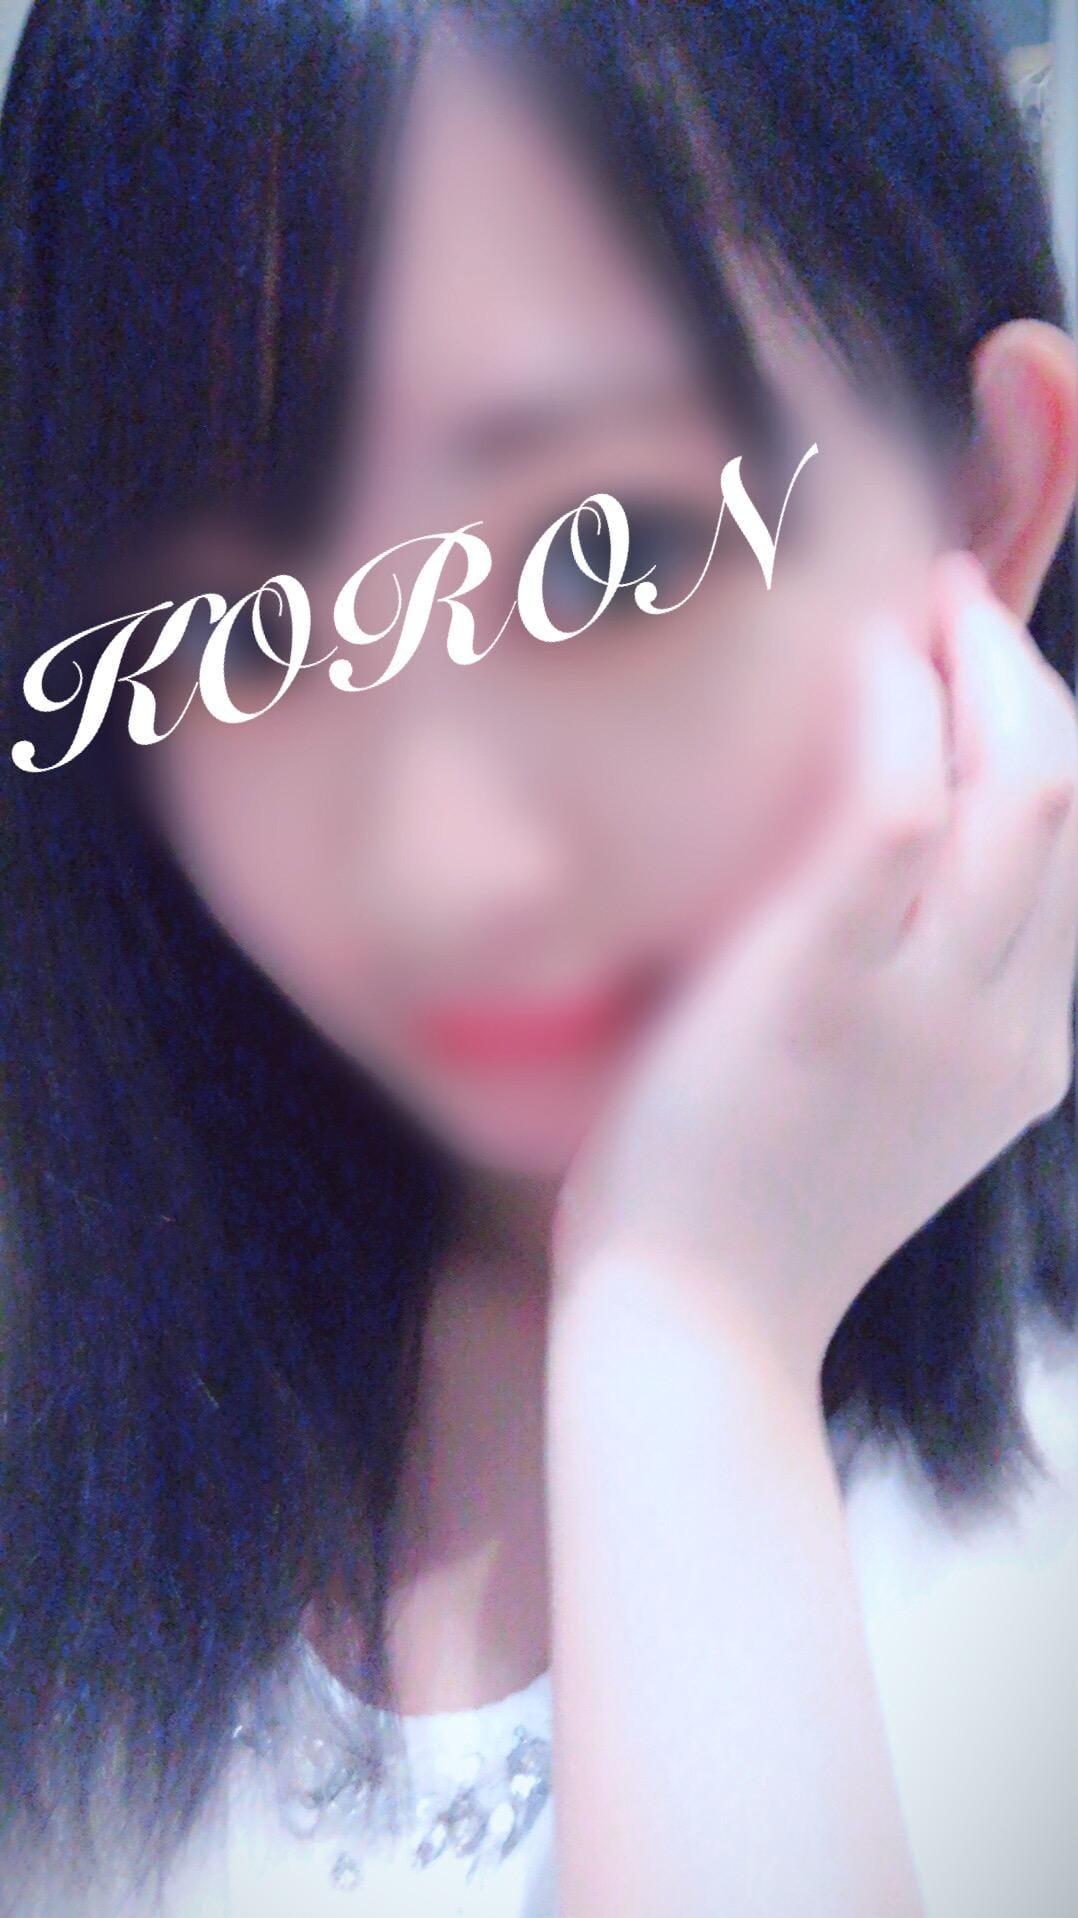 「*KORON*」07/31(07/31) 13:22 | ころんの写メ・風俗動画